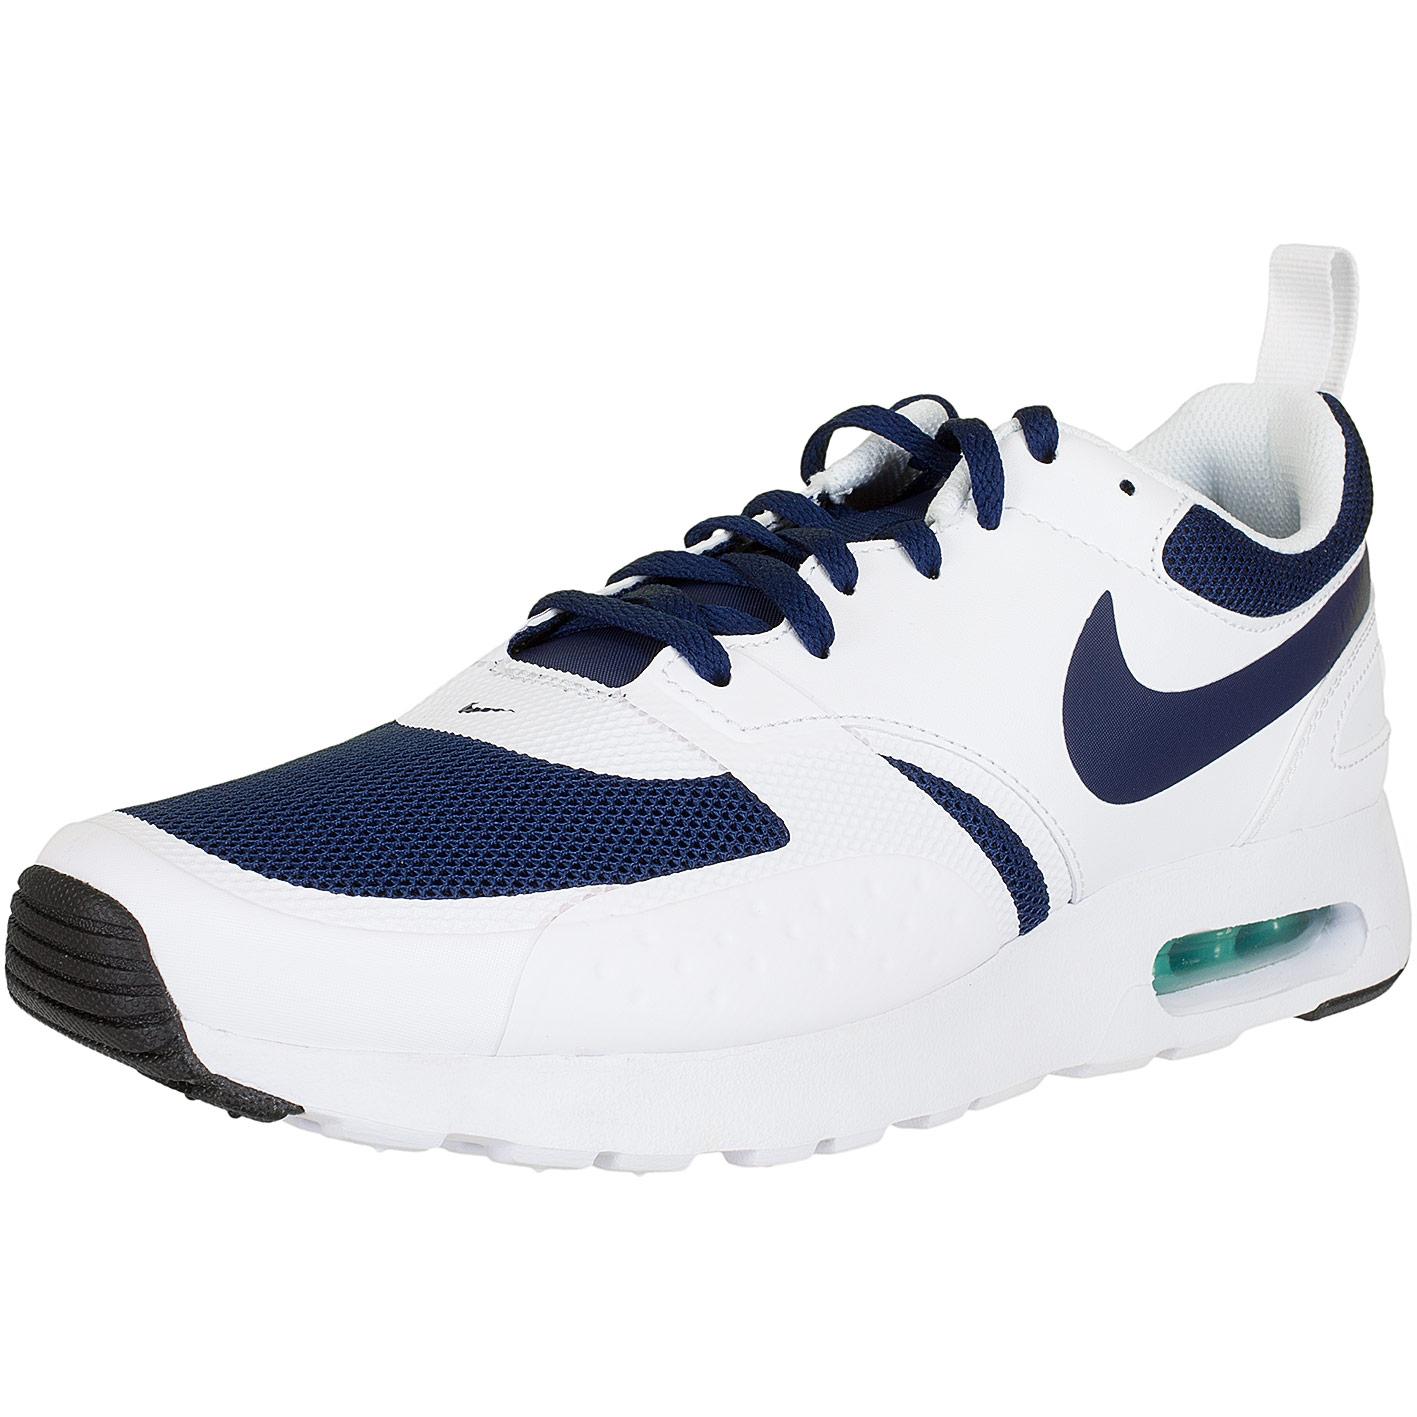 Nike Air Max Vision SE Herren Sneaker für 89,90€ inkl. Versand…